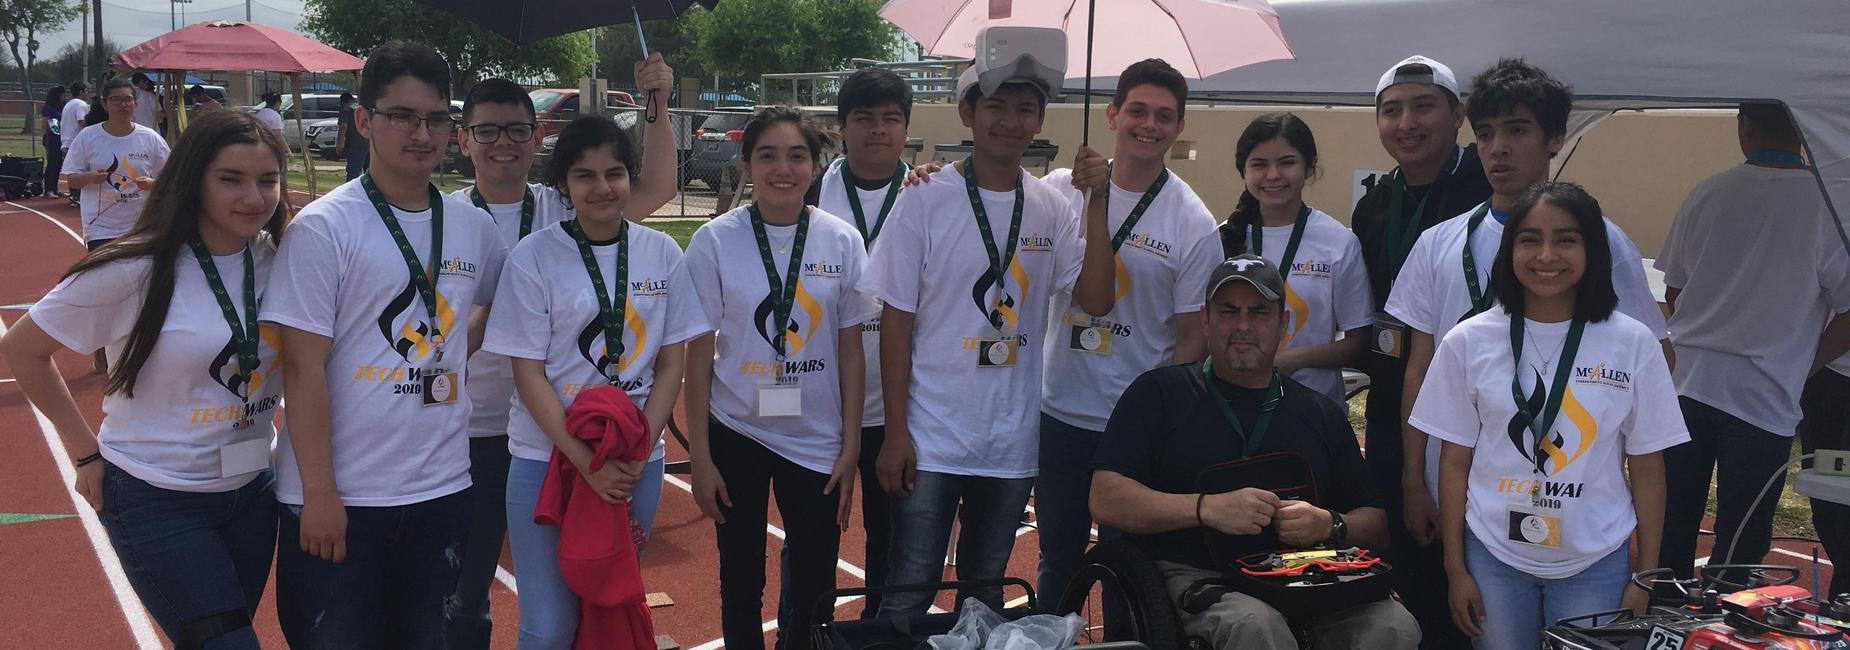 Lamar Academy Robotics Team at TechWars